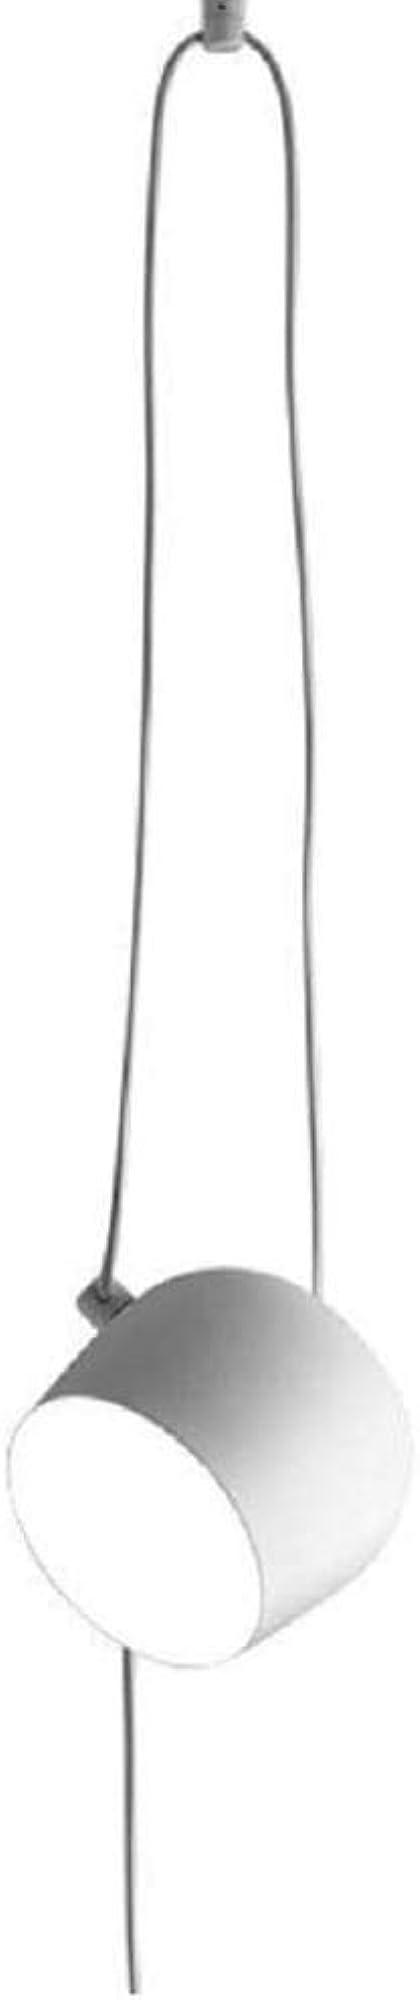 Flos aim led lampada sospensione soffitto F0090009